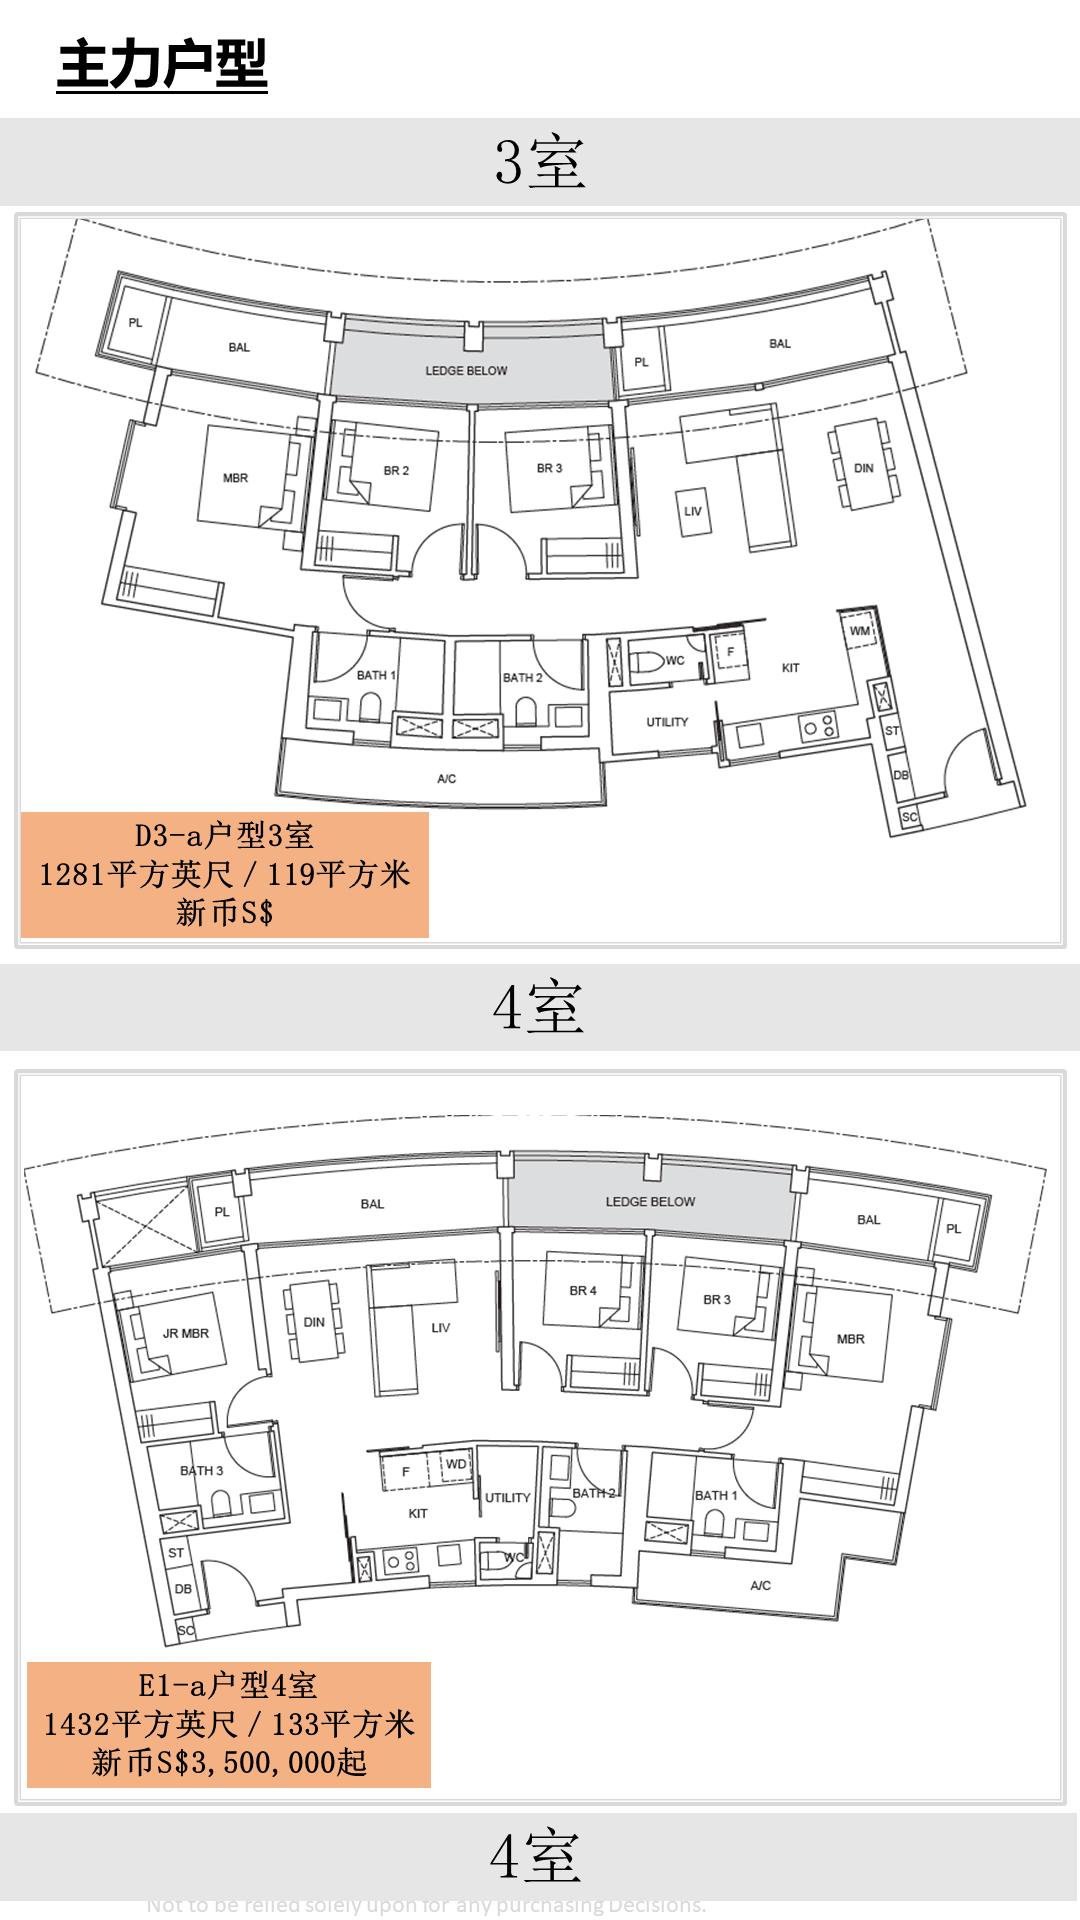 幻灯片27-min.PNG